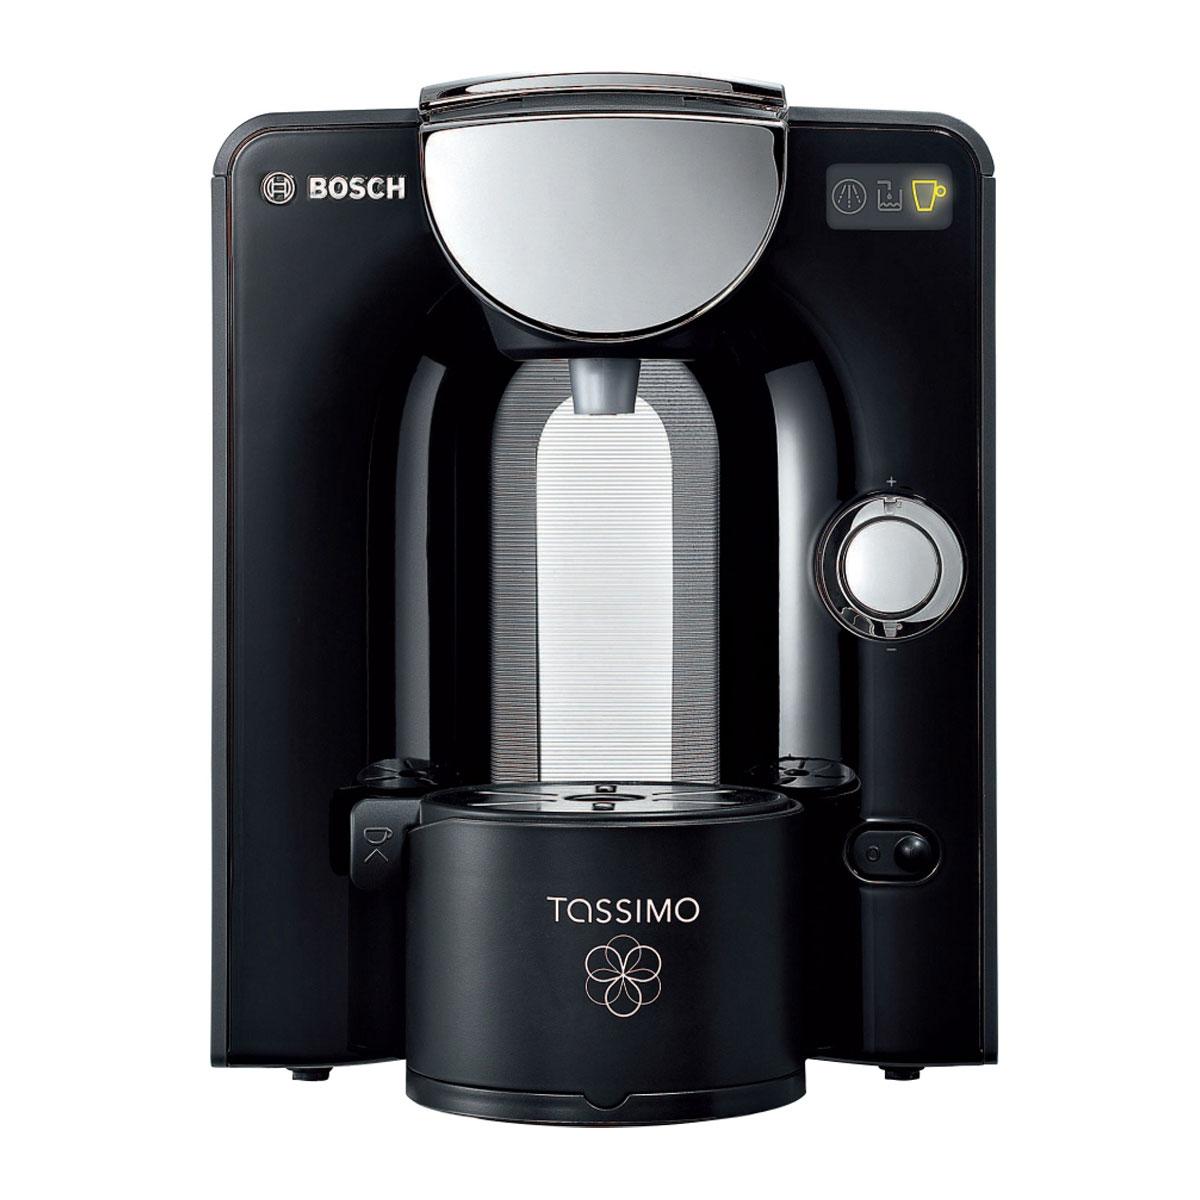 Bosch Tassimo T55 Charmy Multi Drinks Coffee Machine ...